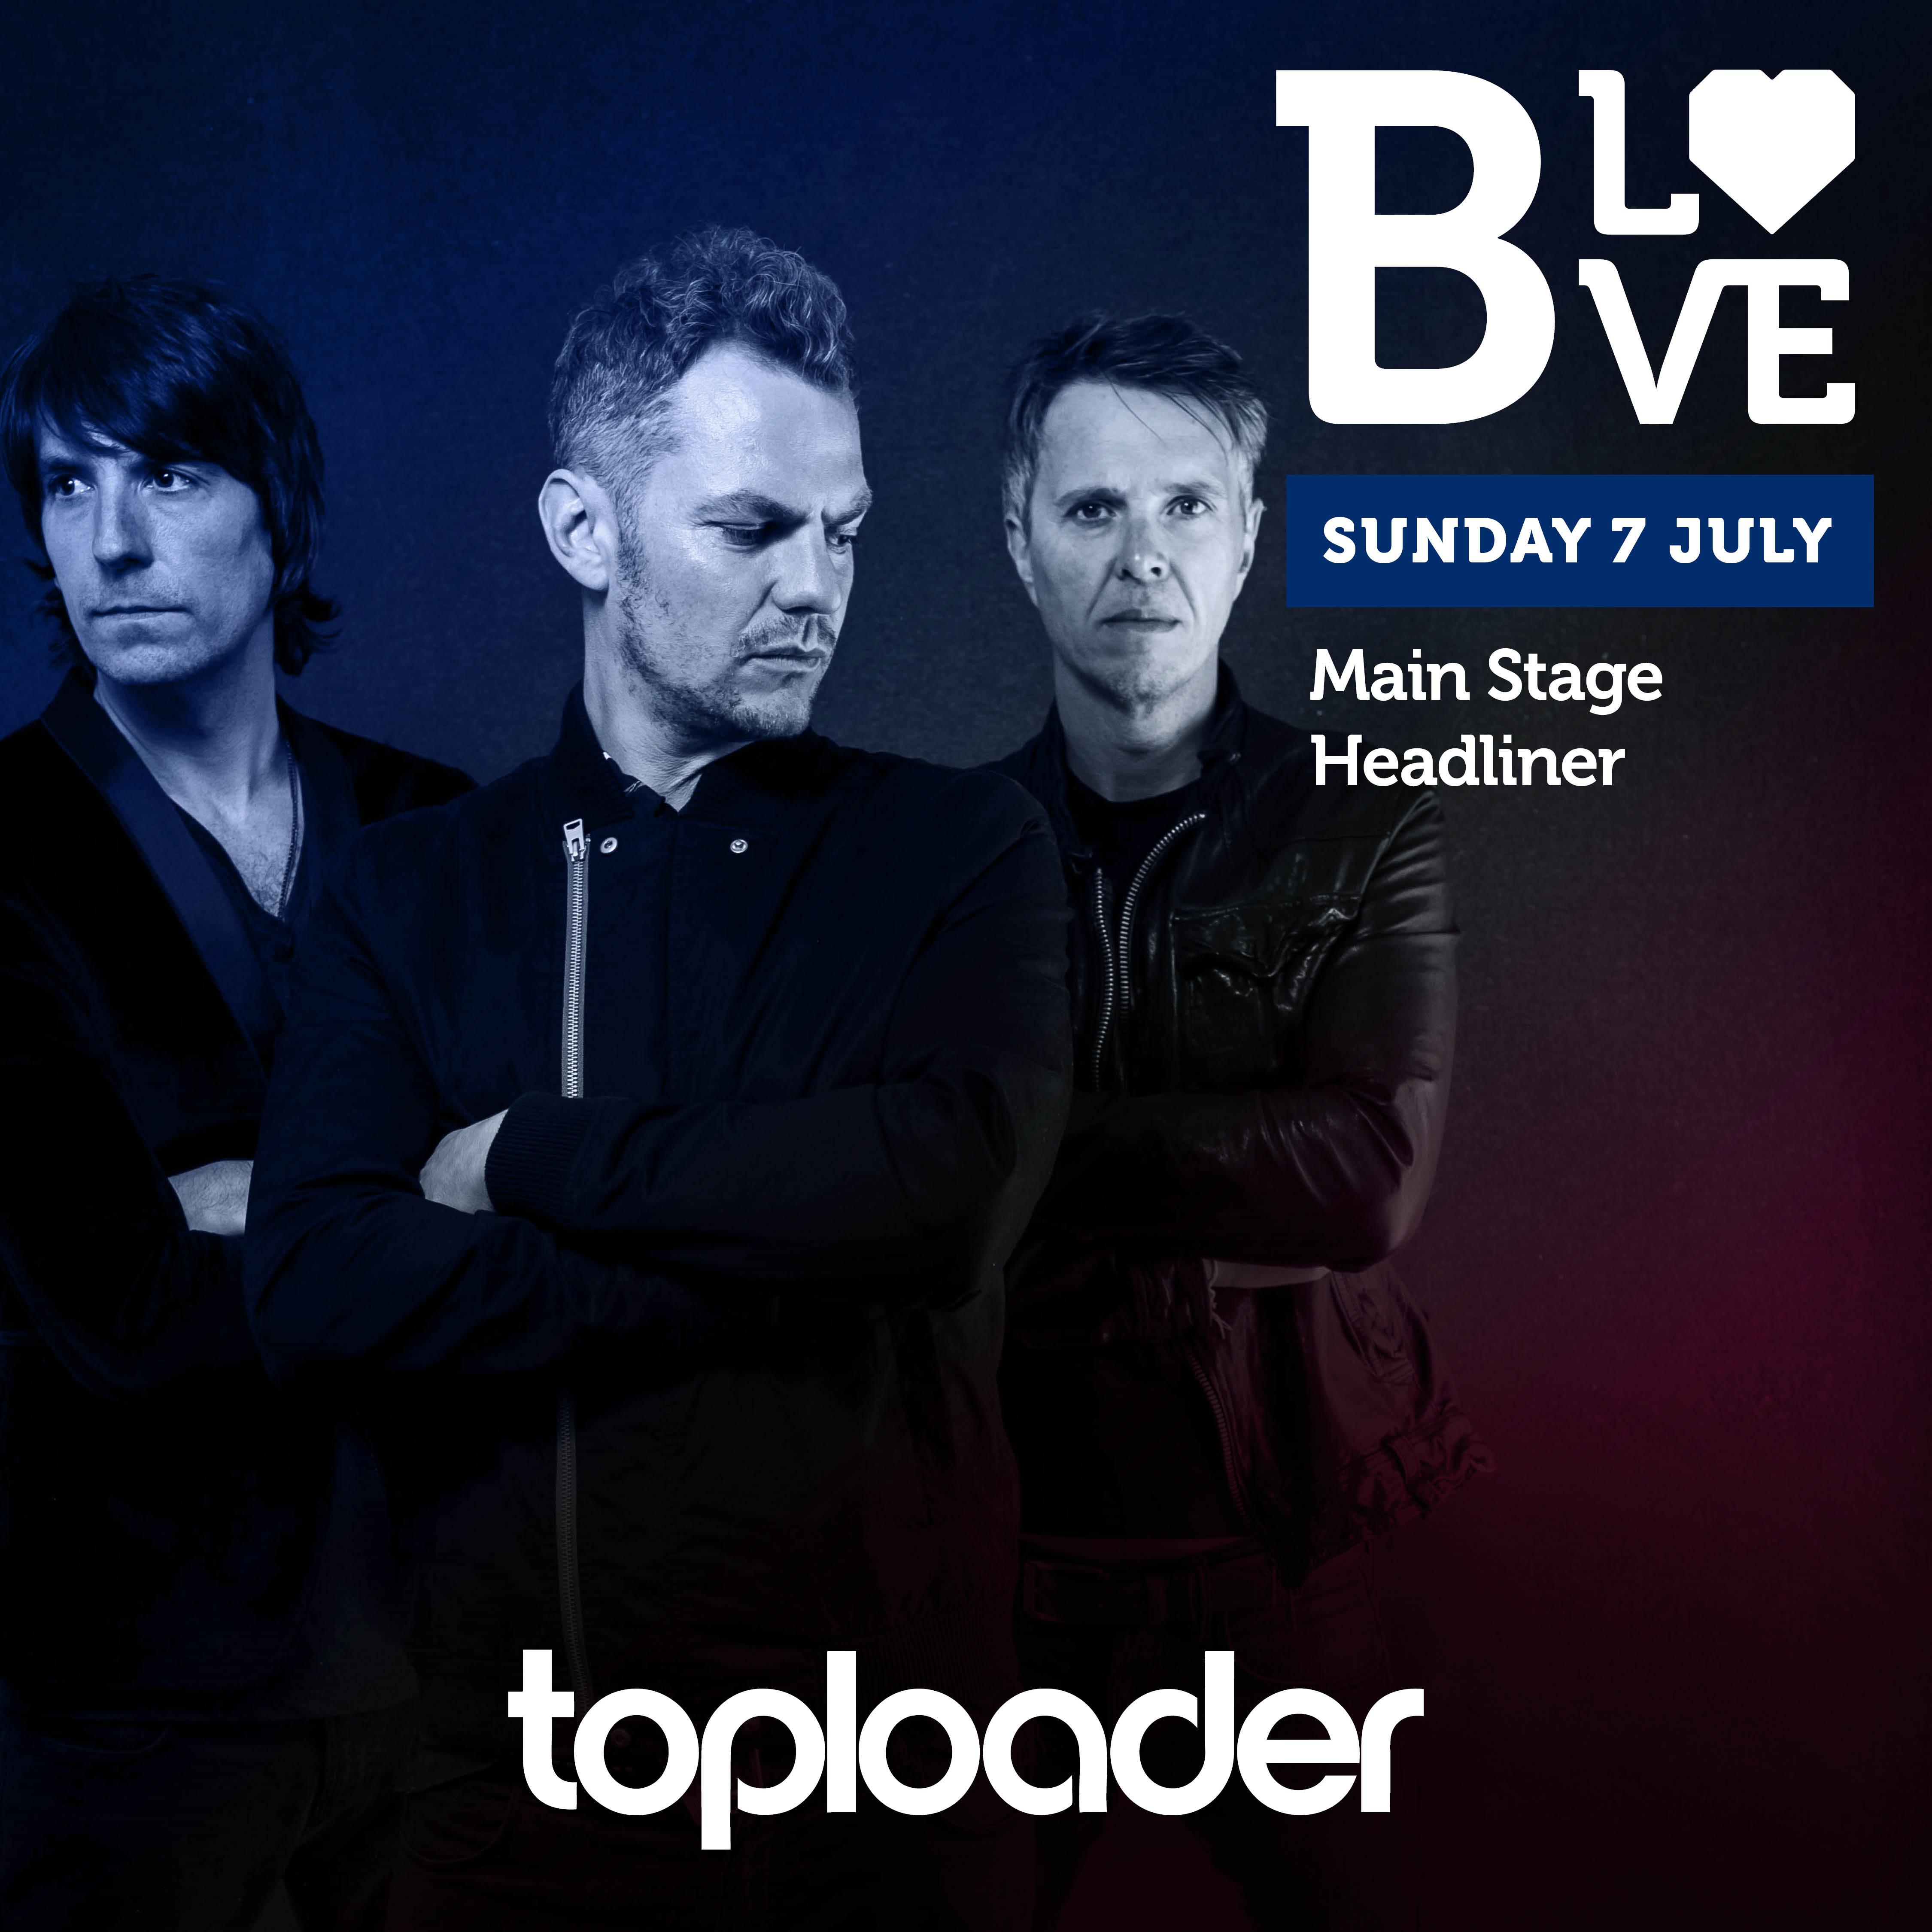 https://blovemusic.com/wp-content/uploads/2019/01/29839-B-Love-Toploader-Social-Media-Cards_FB_INSTA_PROOF1.jpg